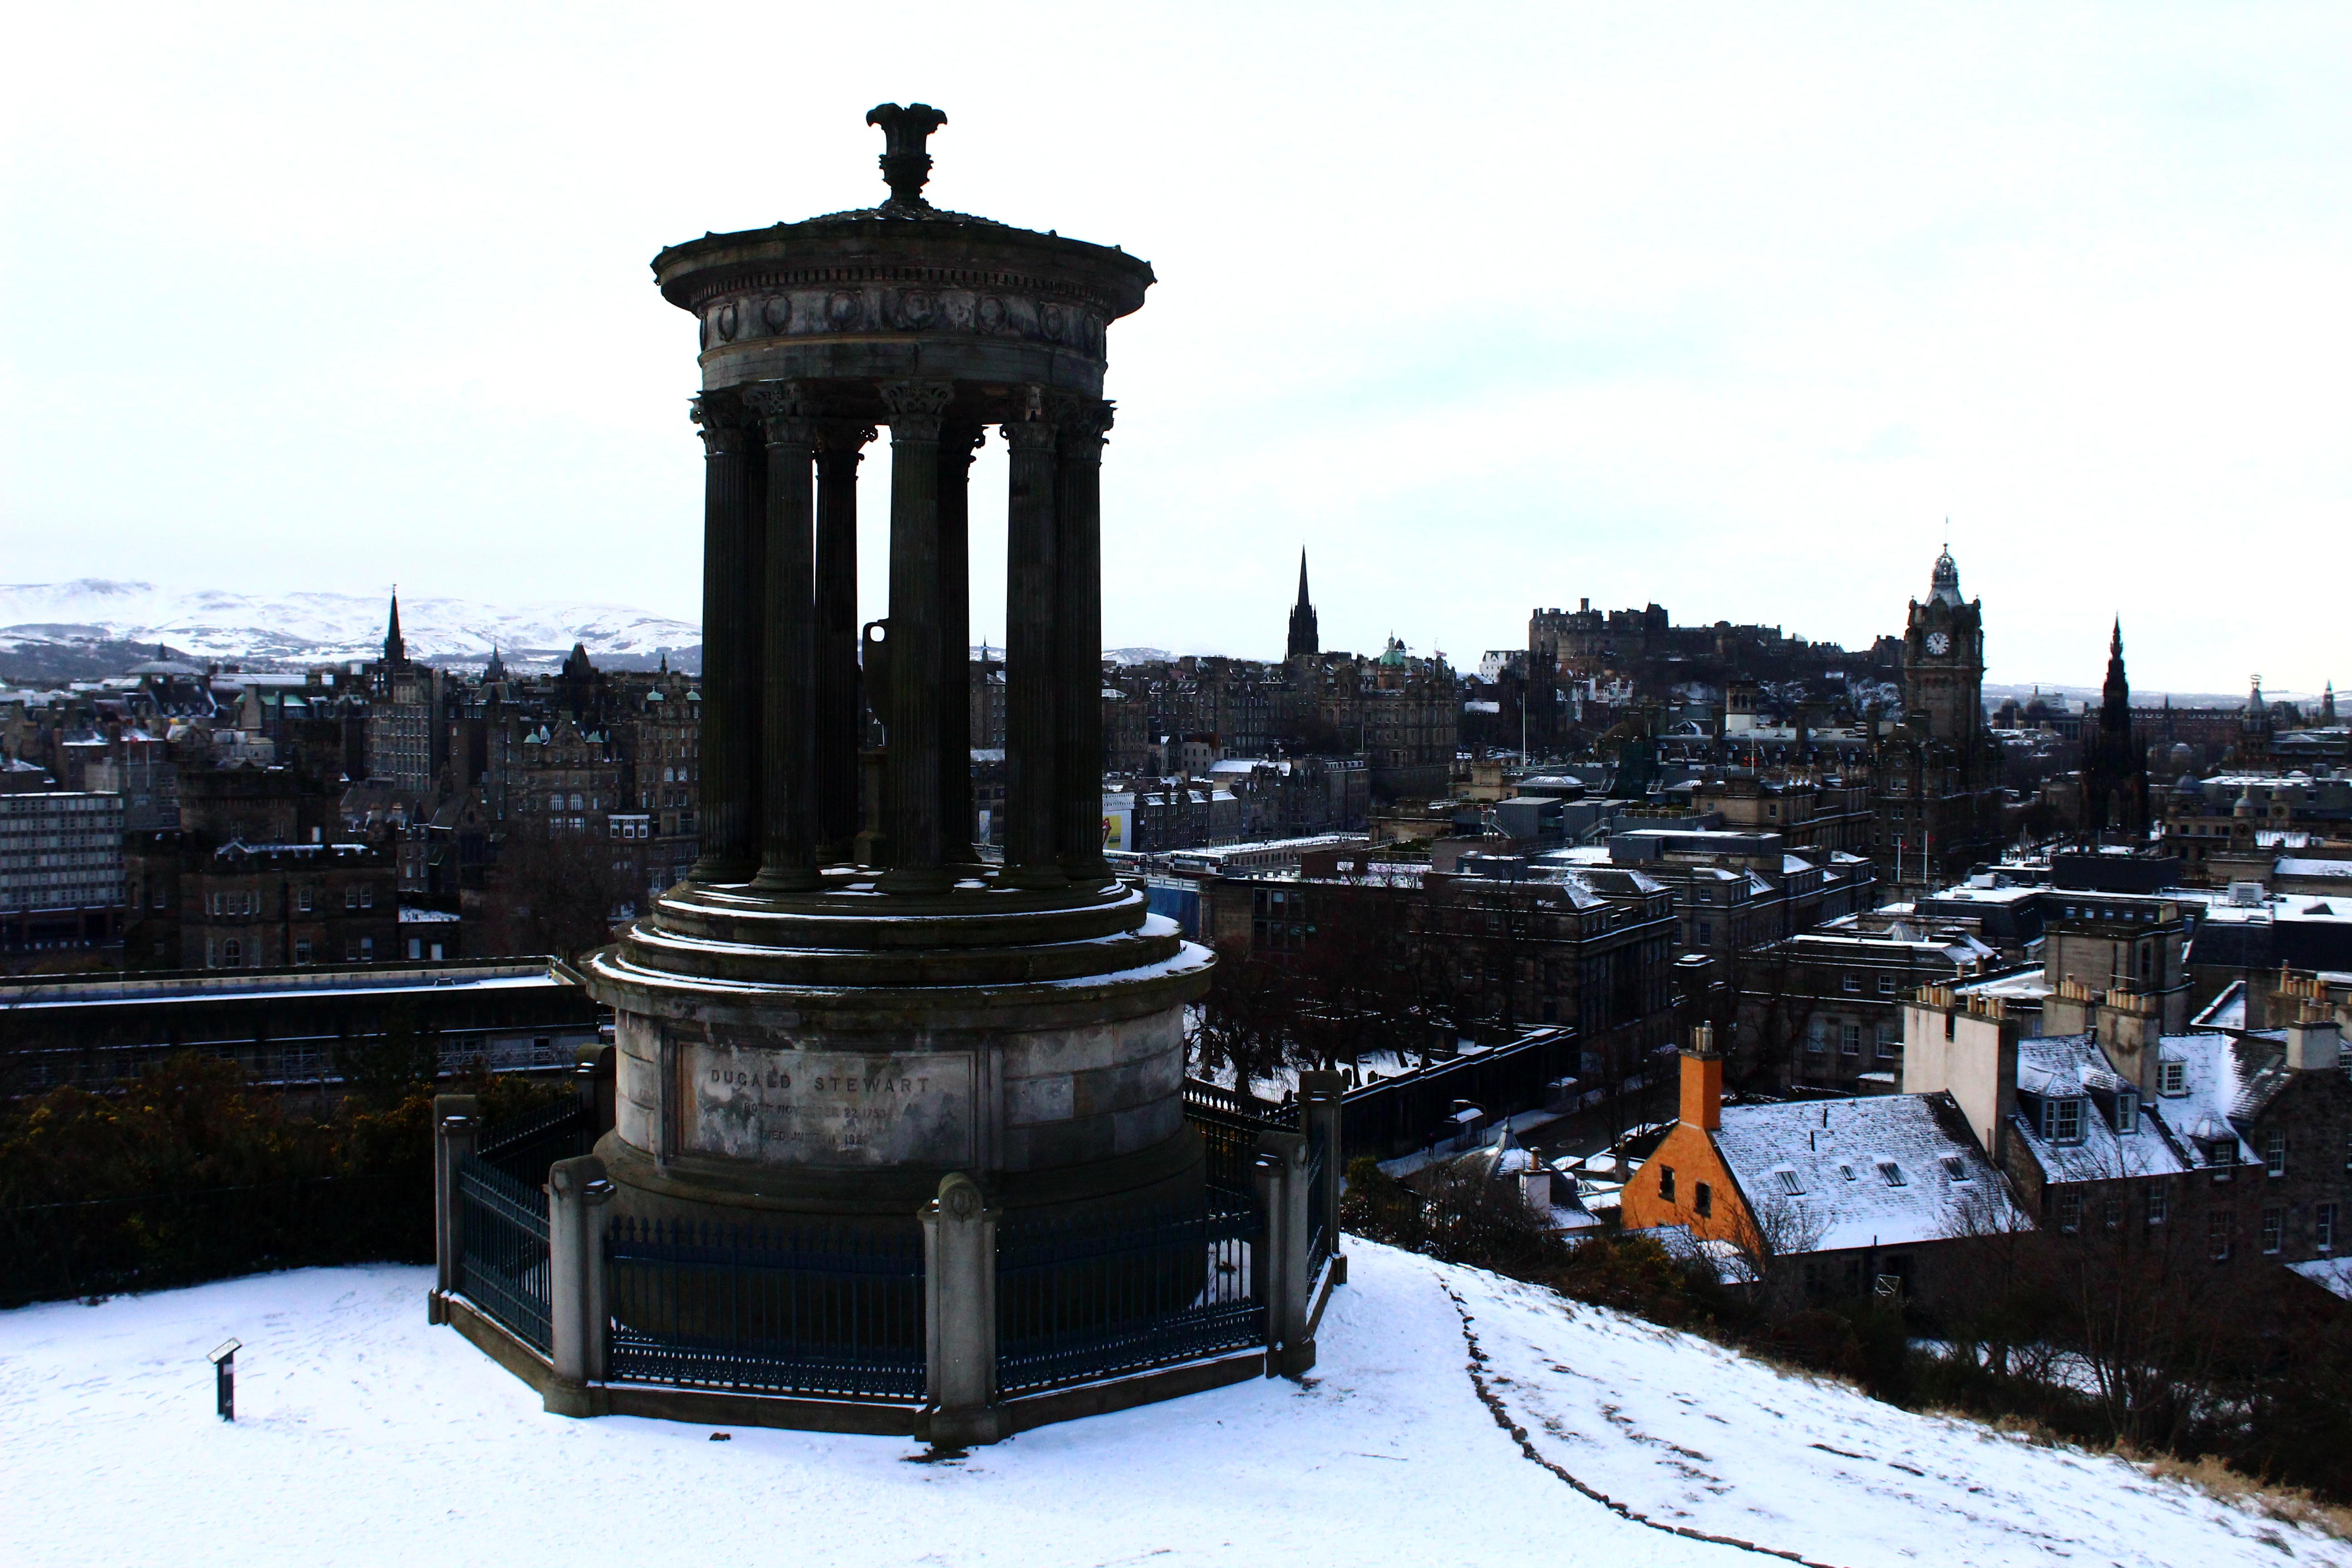 Snow in Edinburgh in February & March